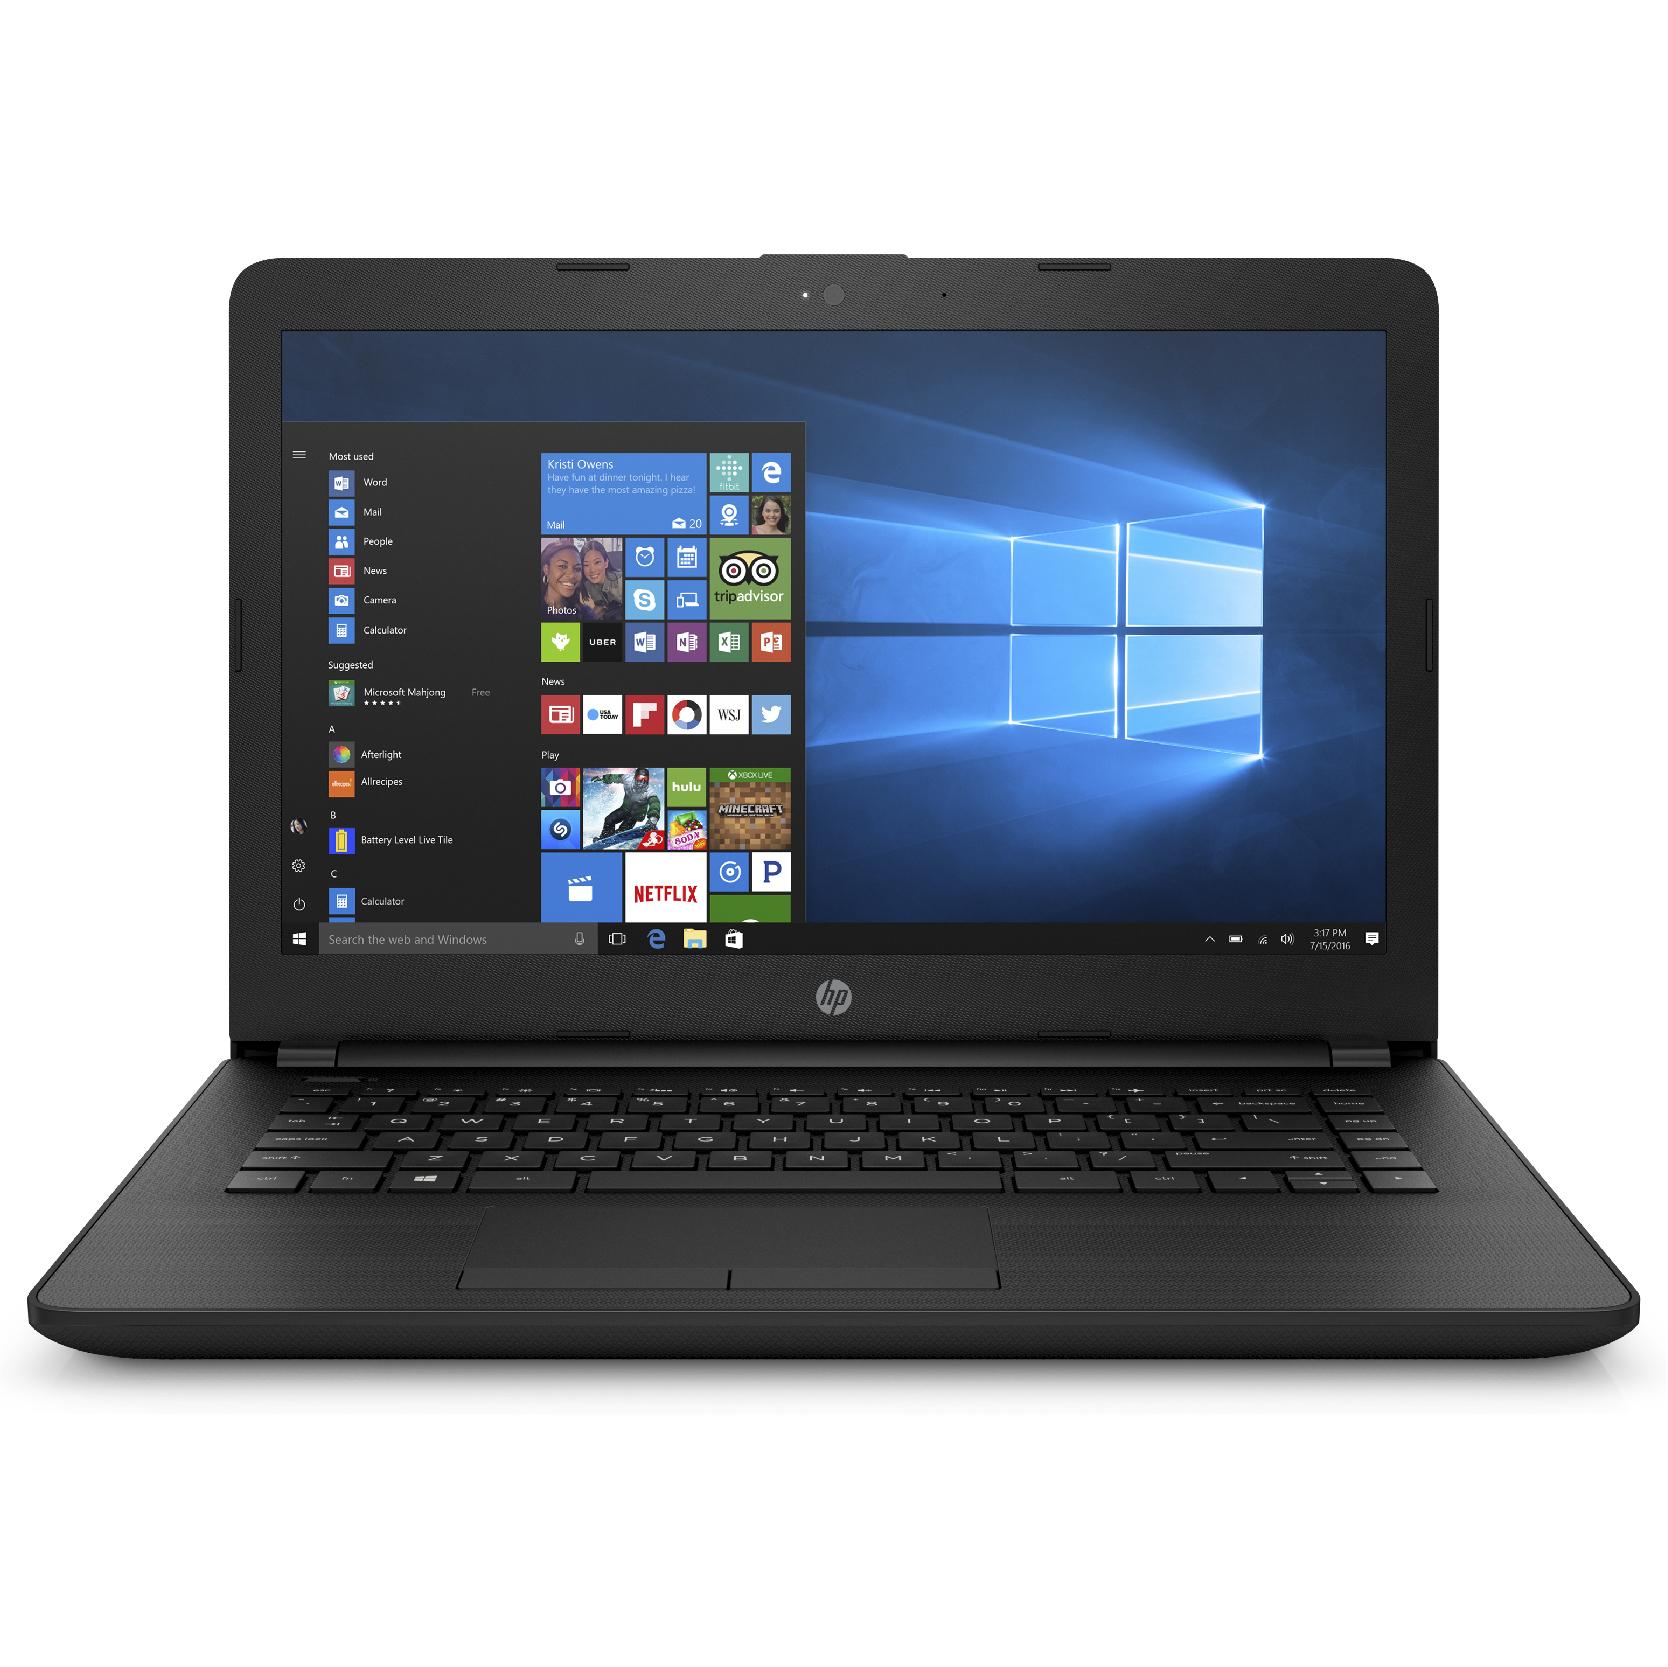 HP 14-bs014na Celeron N3060  14.0 HD AG  4GB  1TB  No ODD  Jet Black DF  W10H62